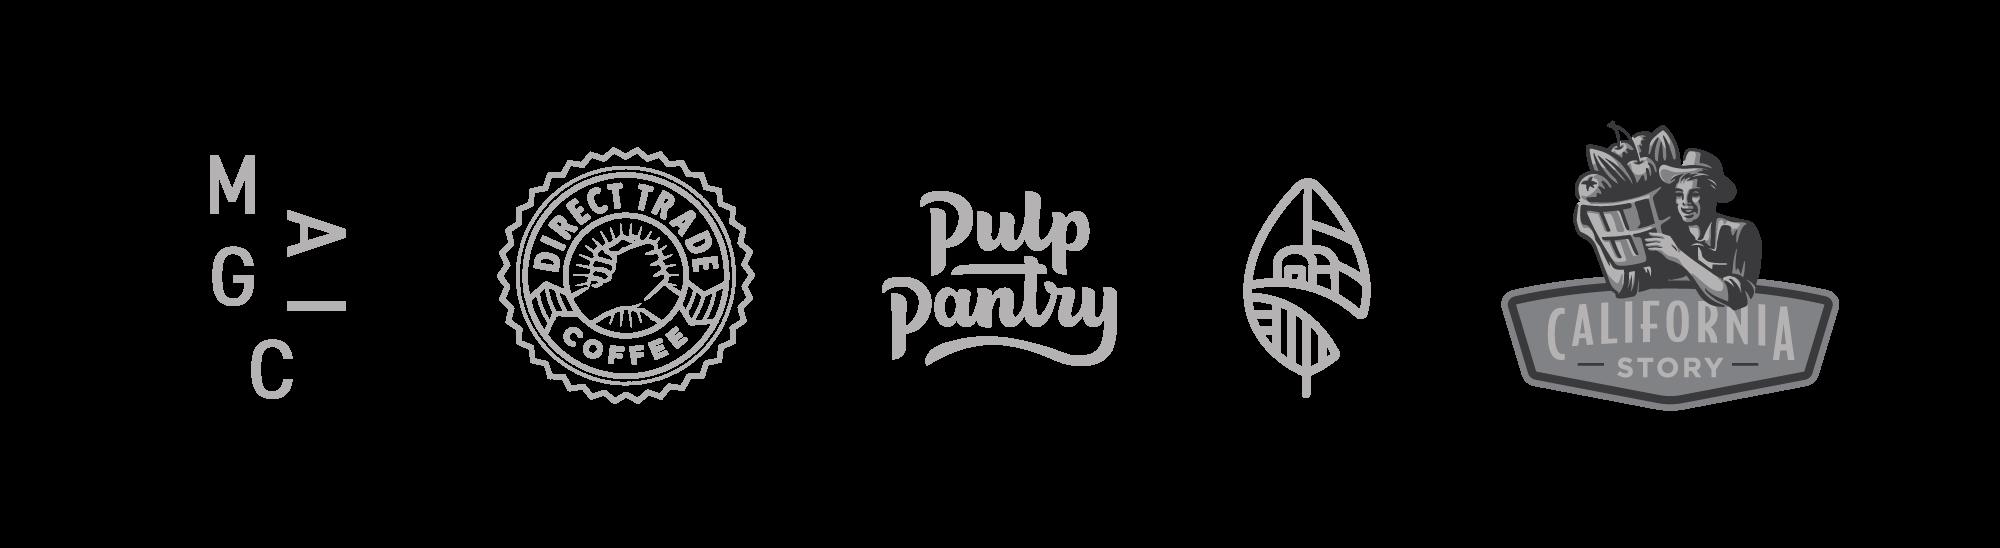 Logos_MelinaSweet.png